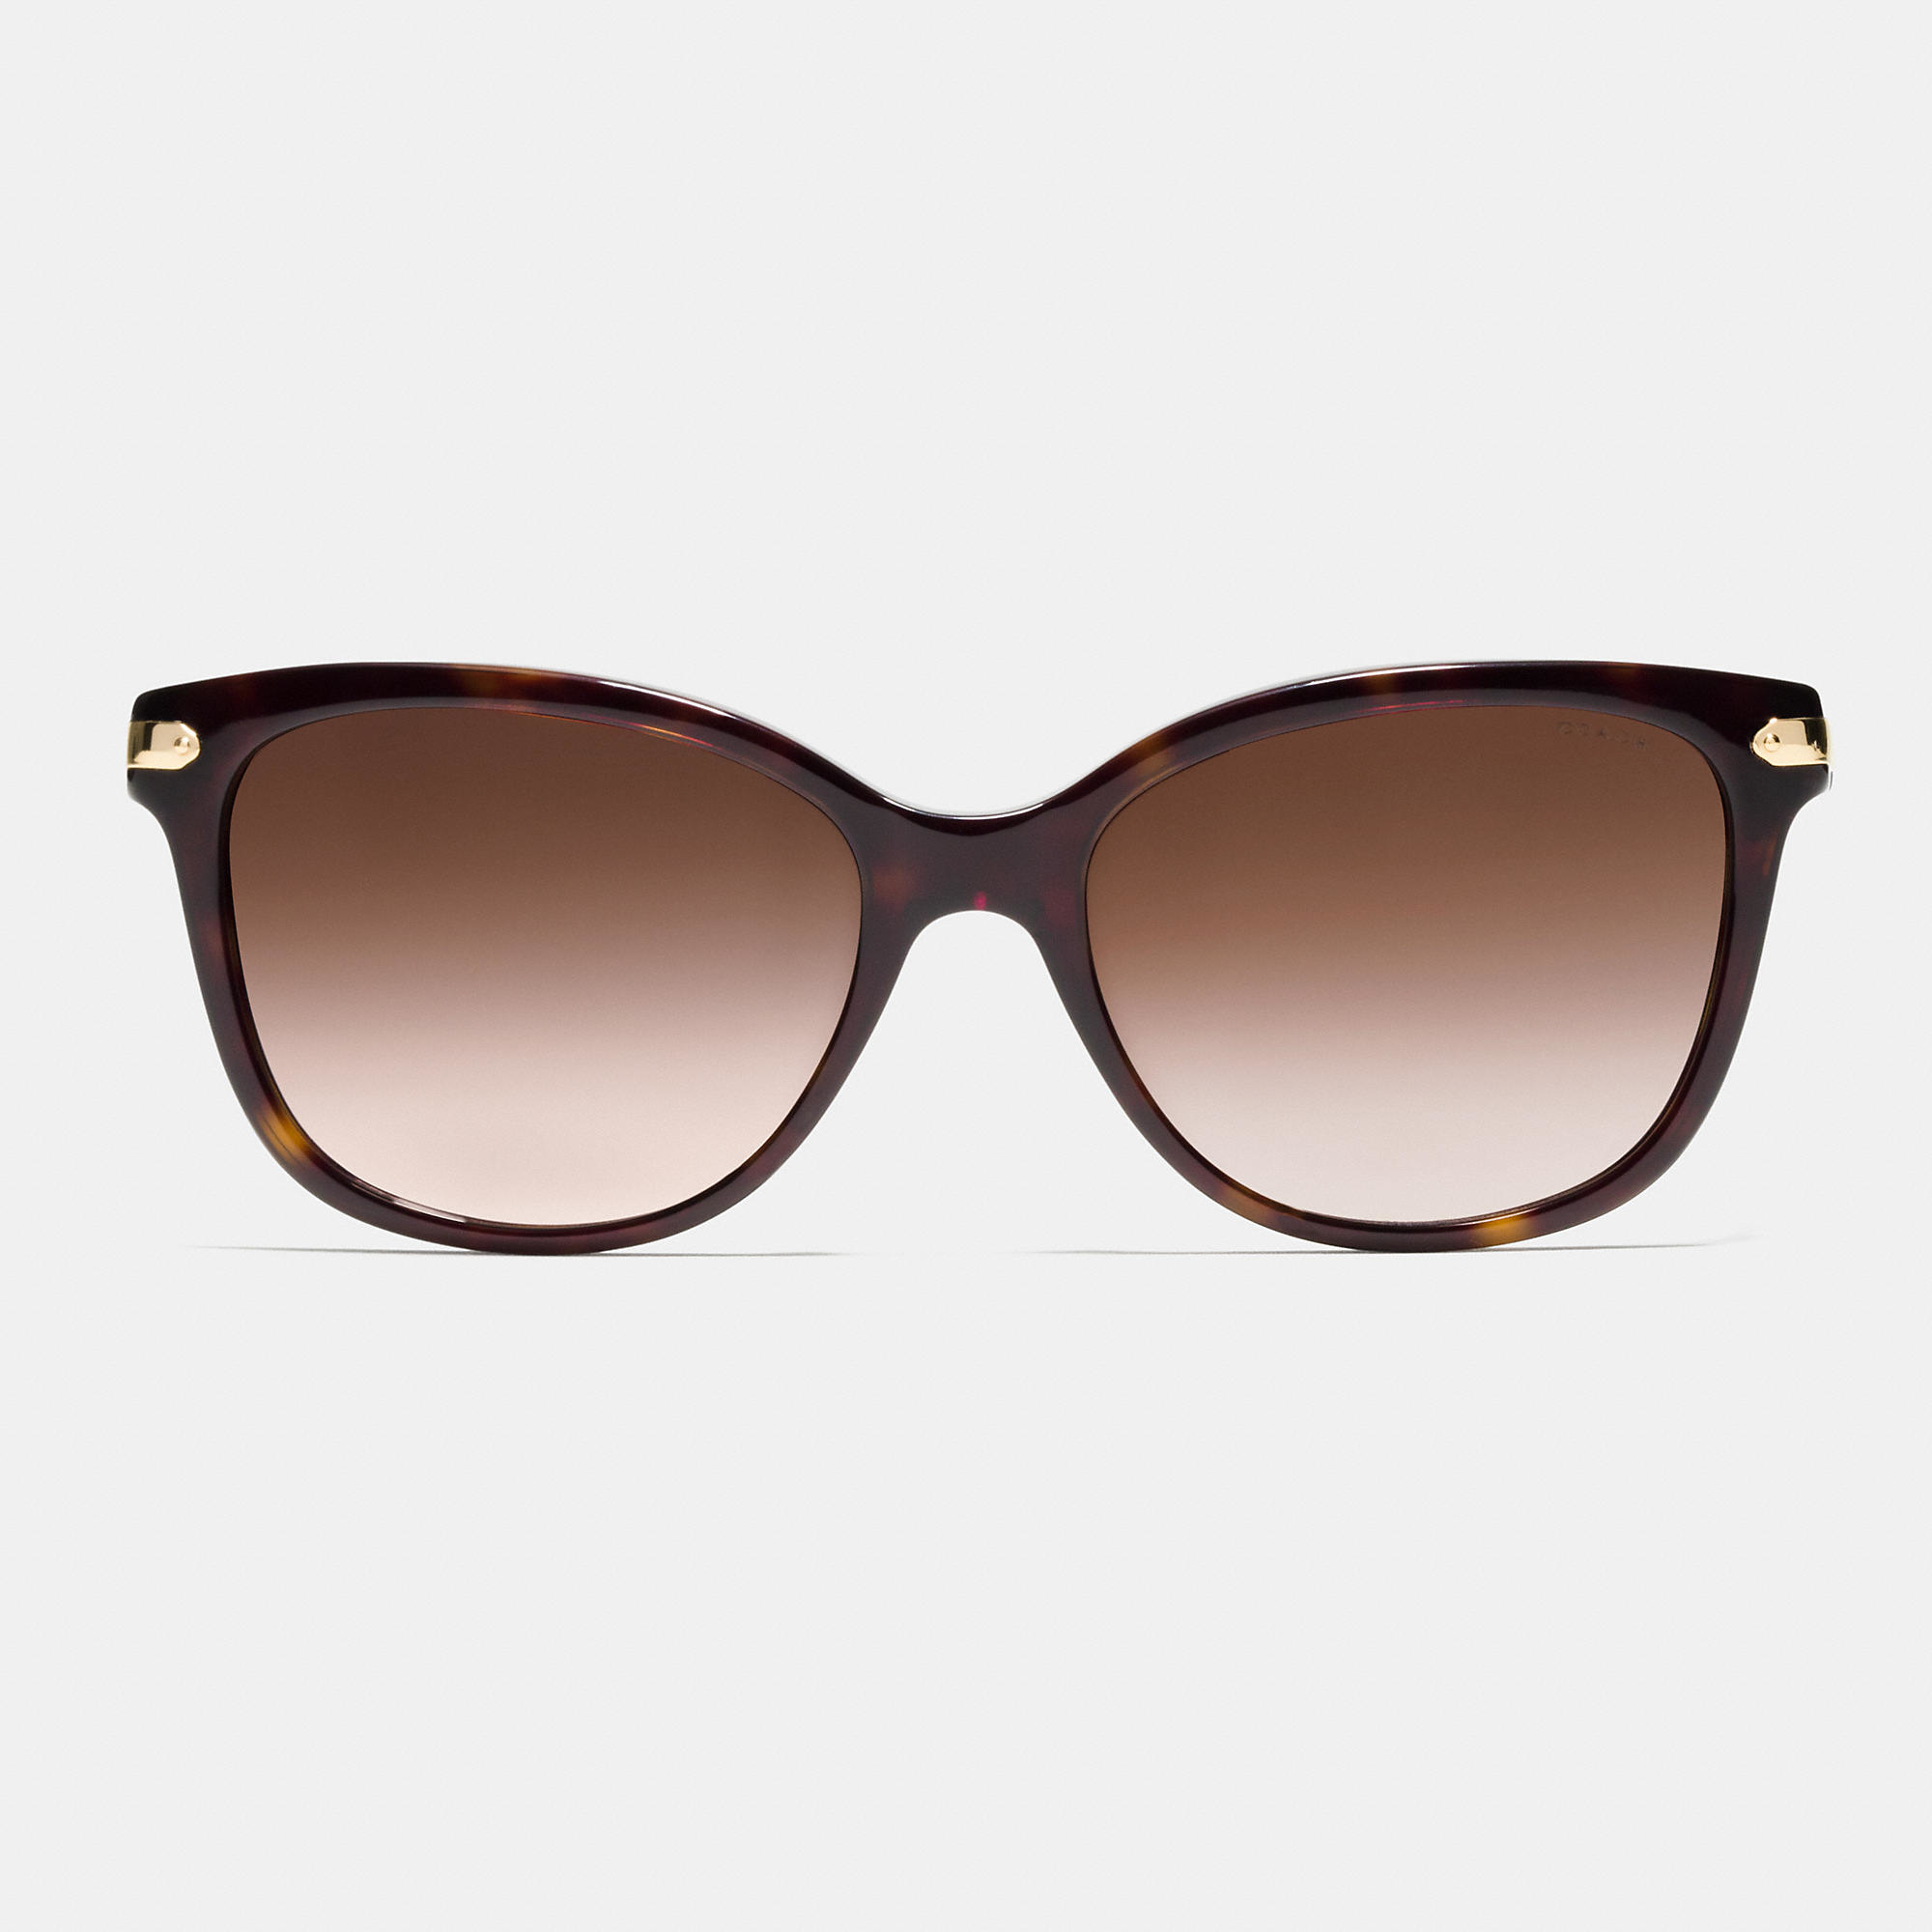 c2b56c43d3876 ... where to buy new arrivals coach polarized sunglasses the best sunglasses  2c400 12843 f58f9 8784b